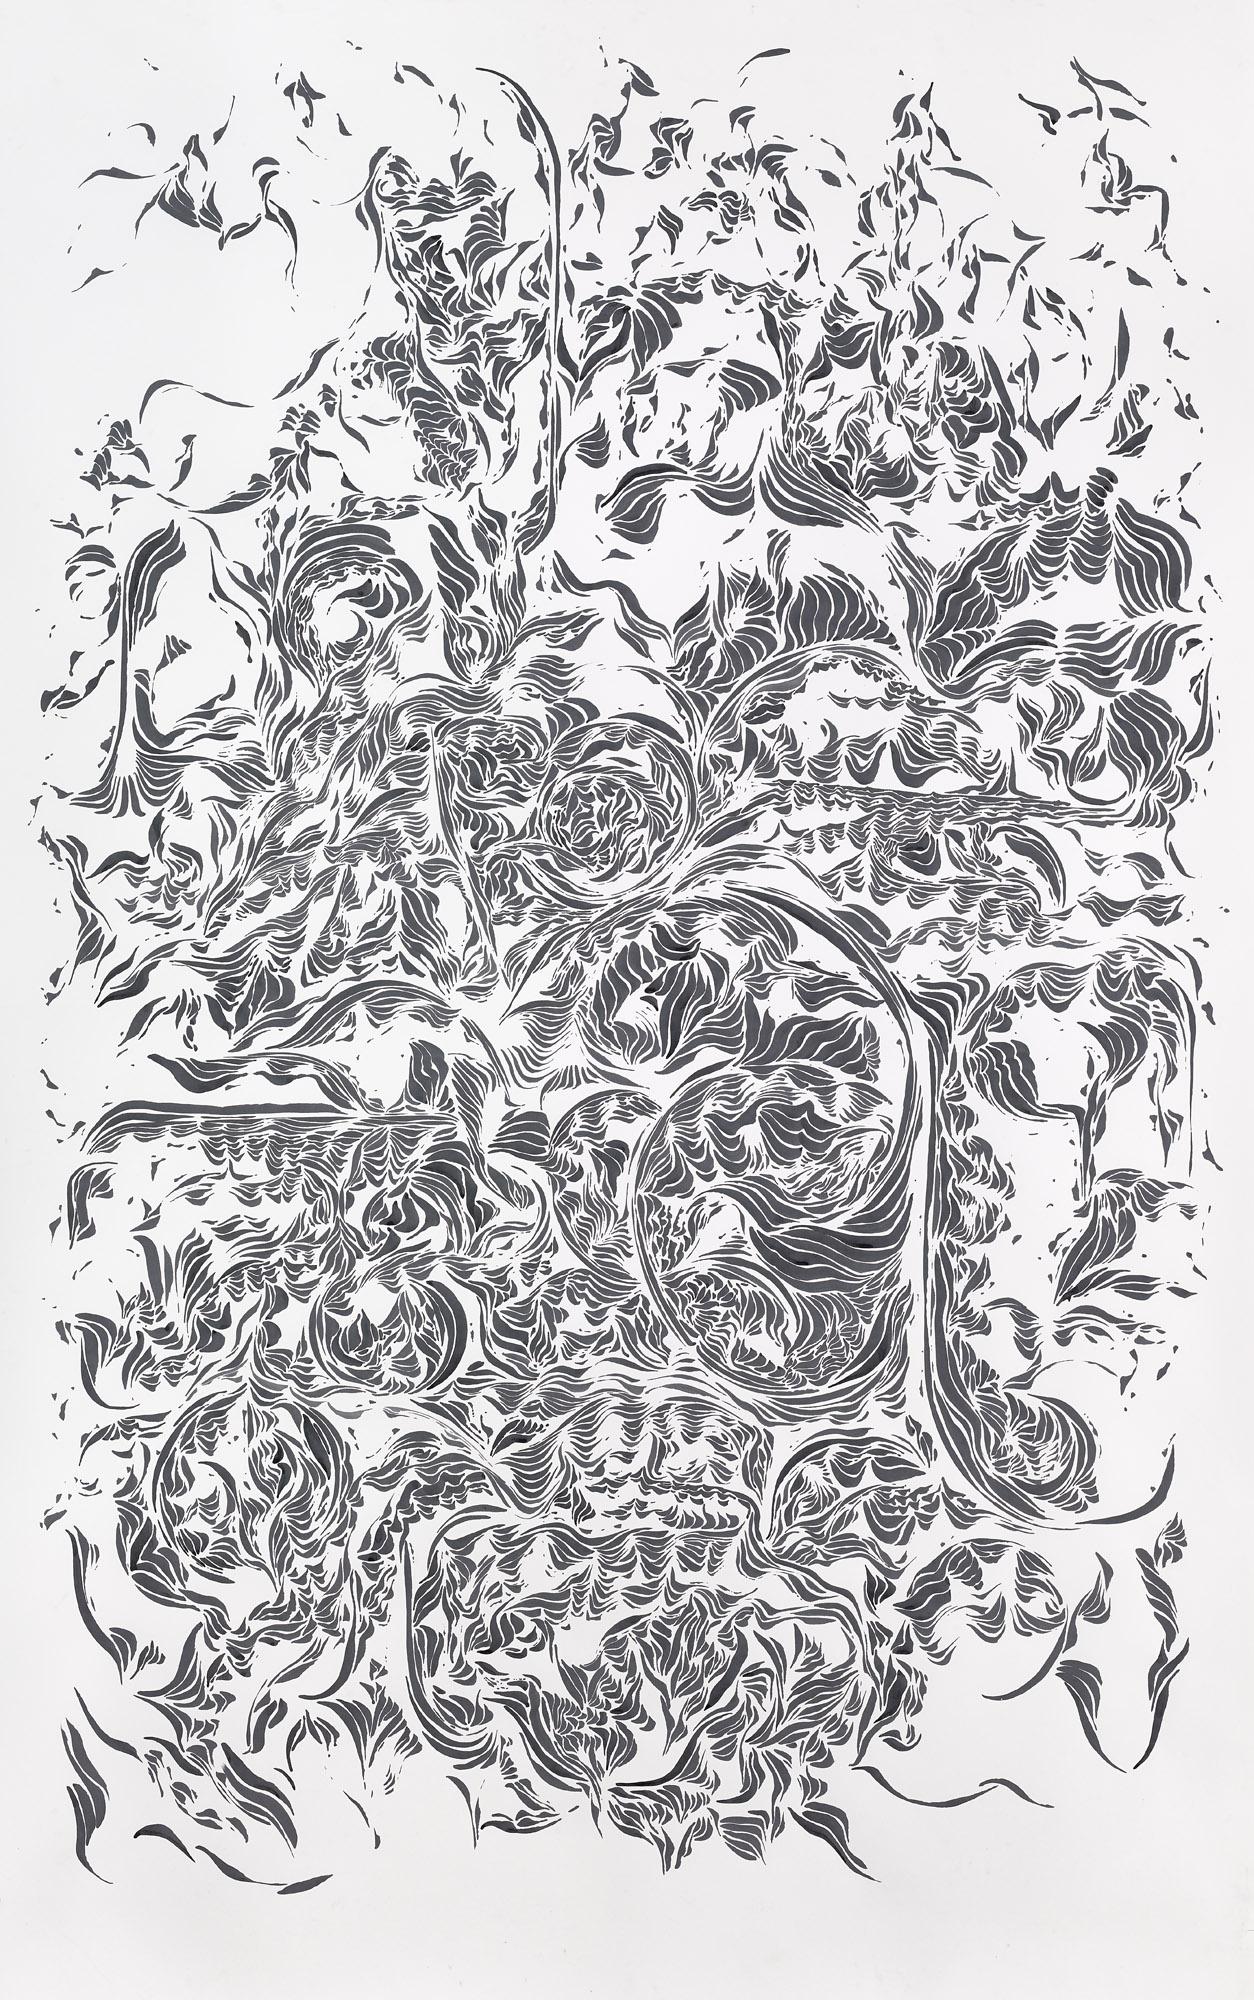 BK P11154 / untitled / ink on paper / 250x150cm / 2015